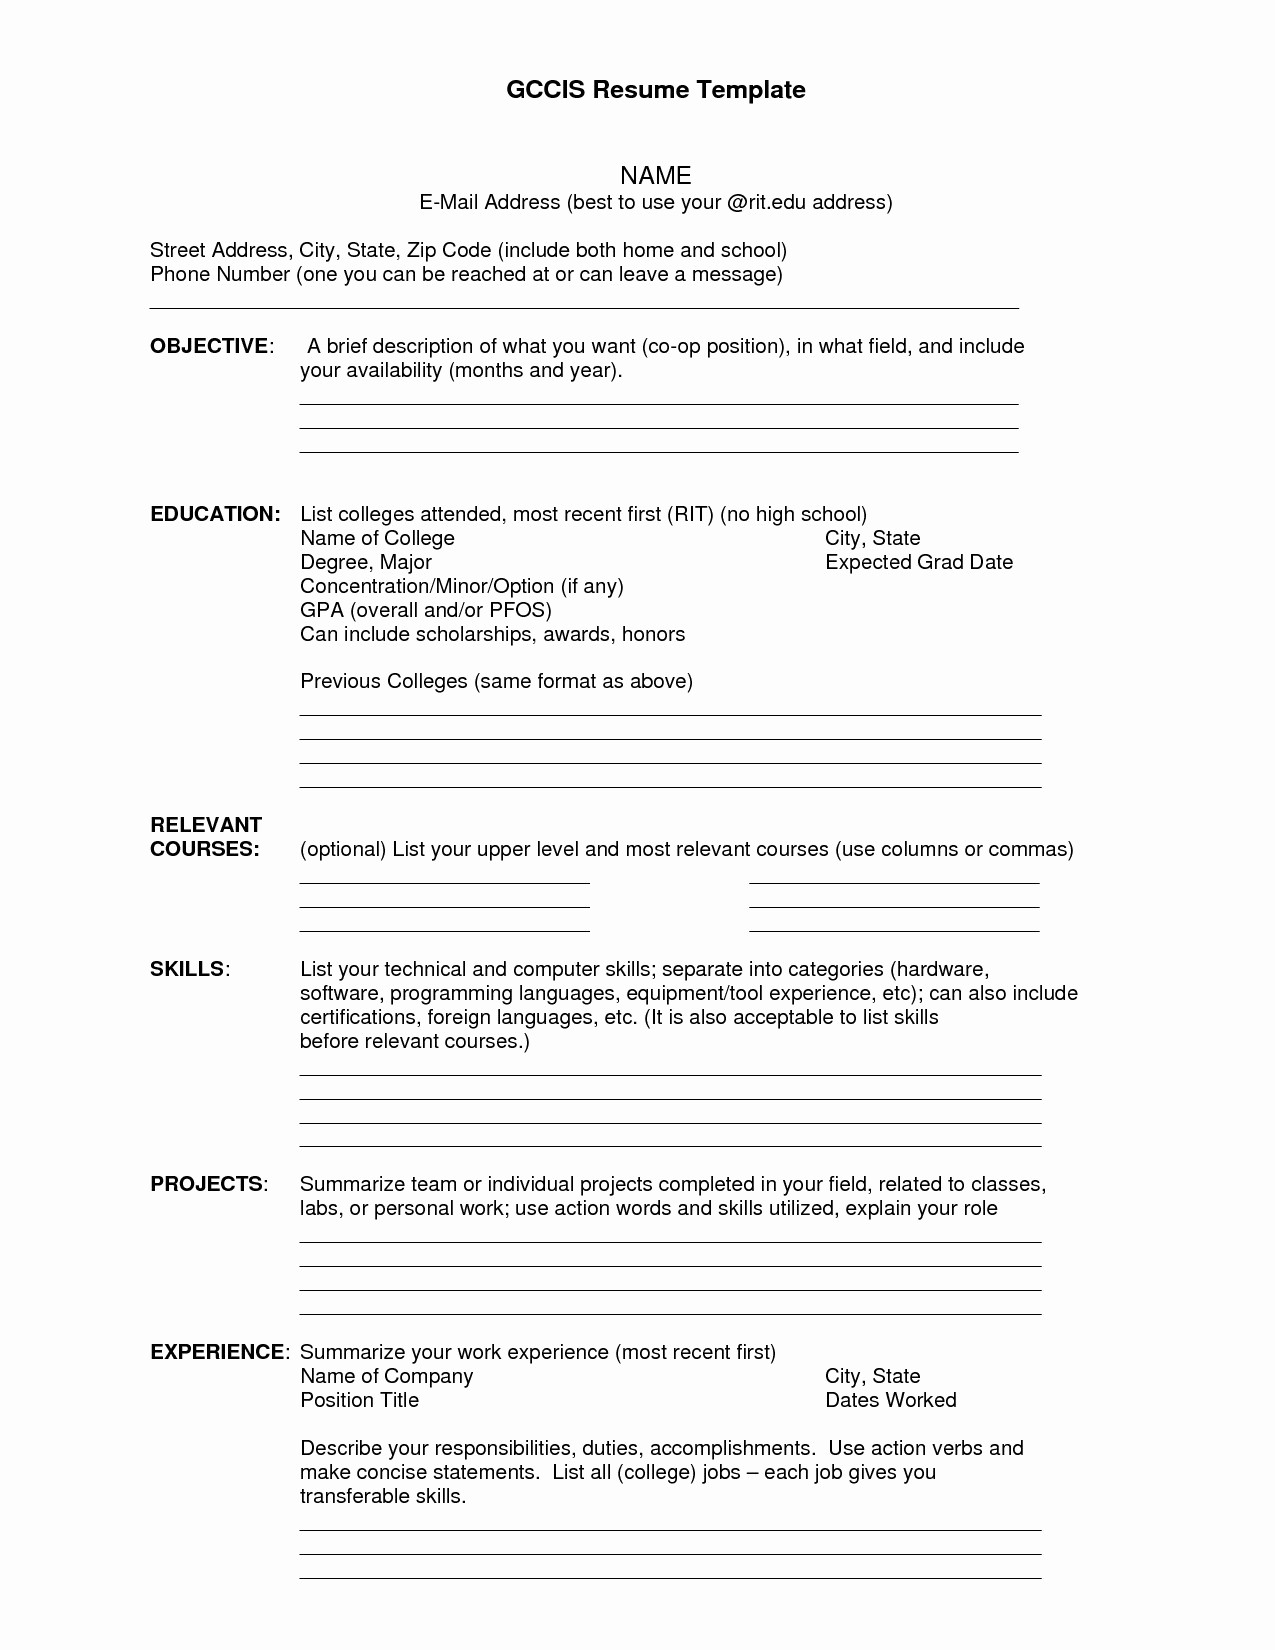 Free Resume Templates Download Pdf Luxury Resumes Free Download Pdf format Reference Blank Resume